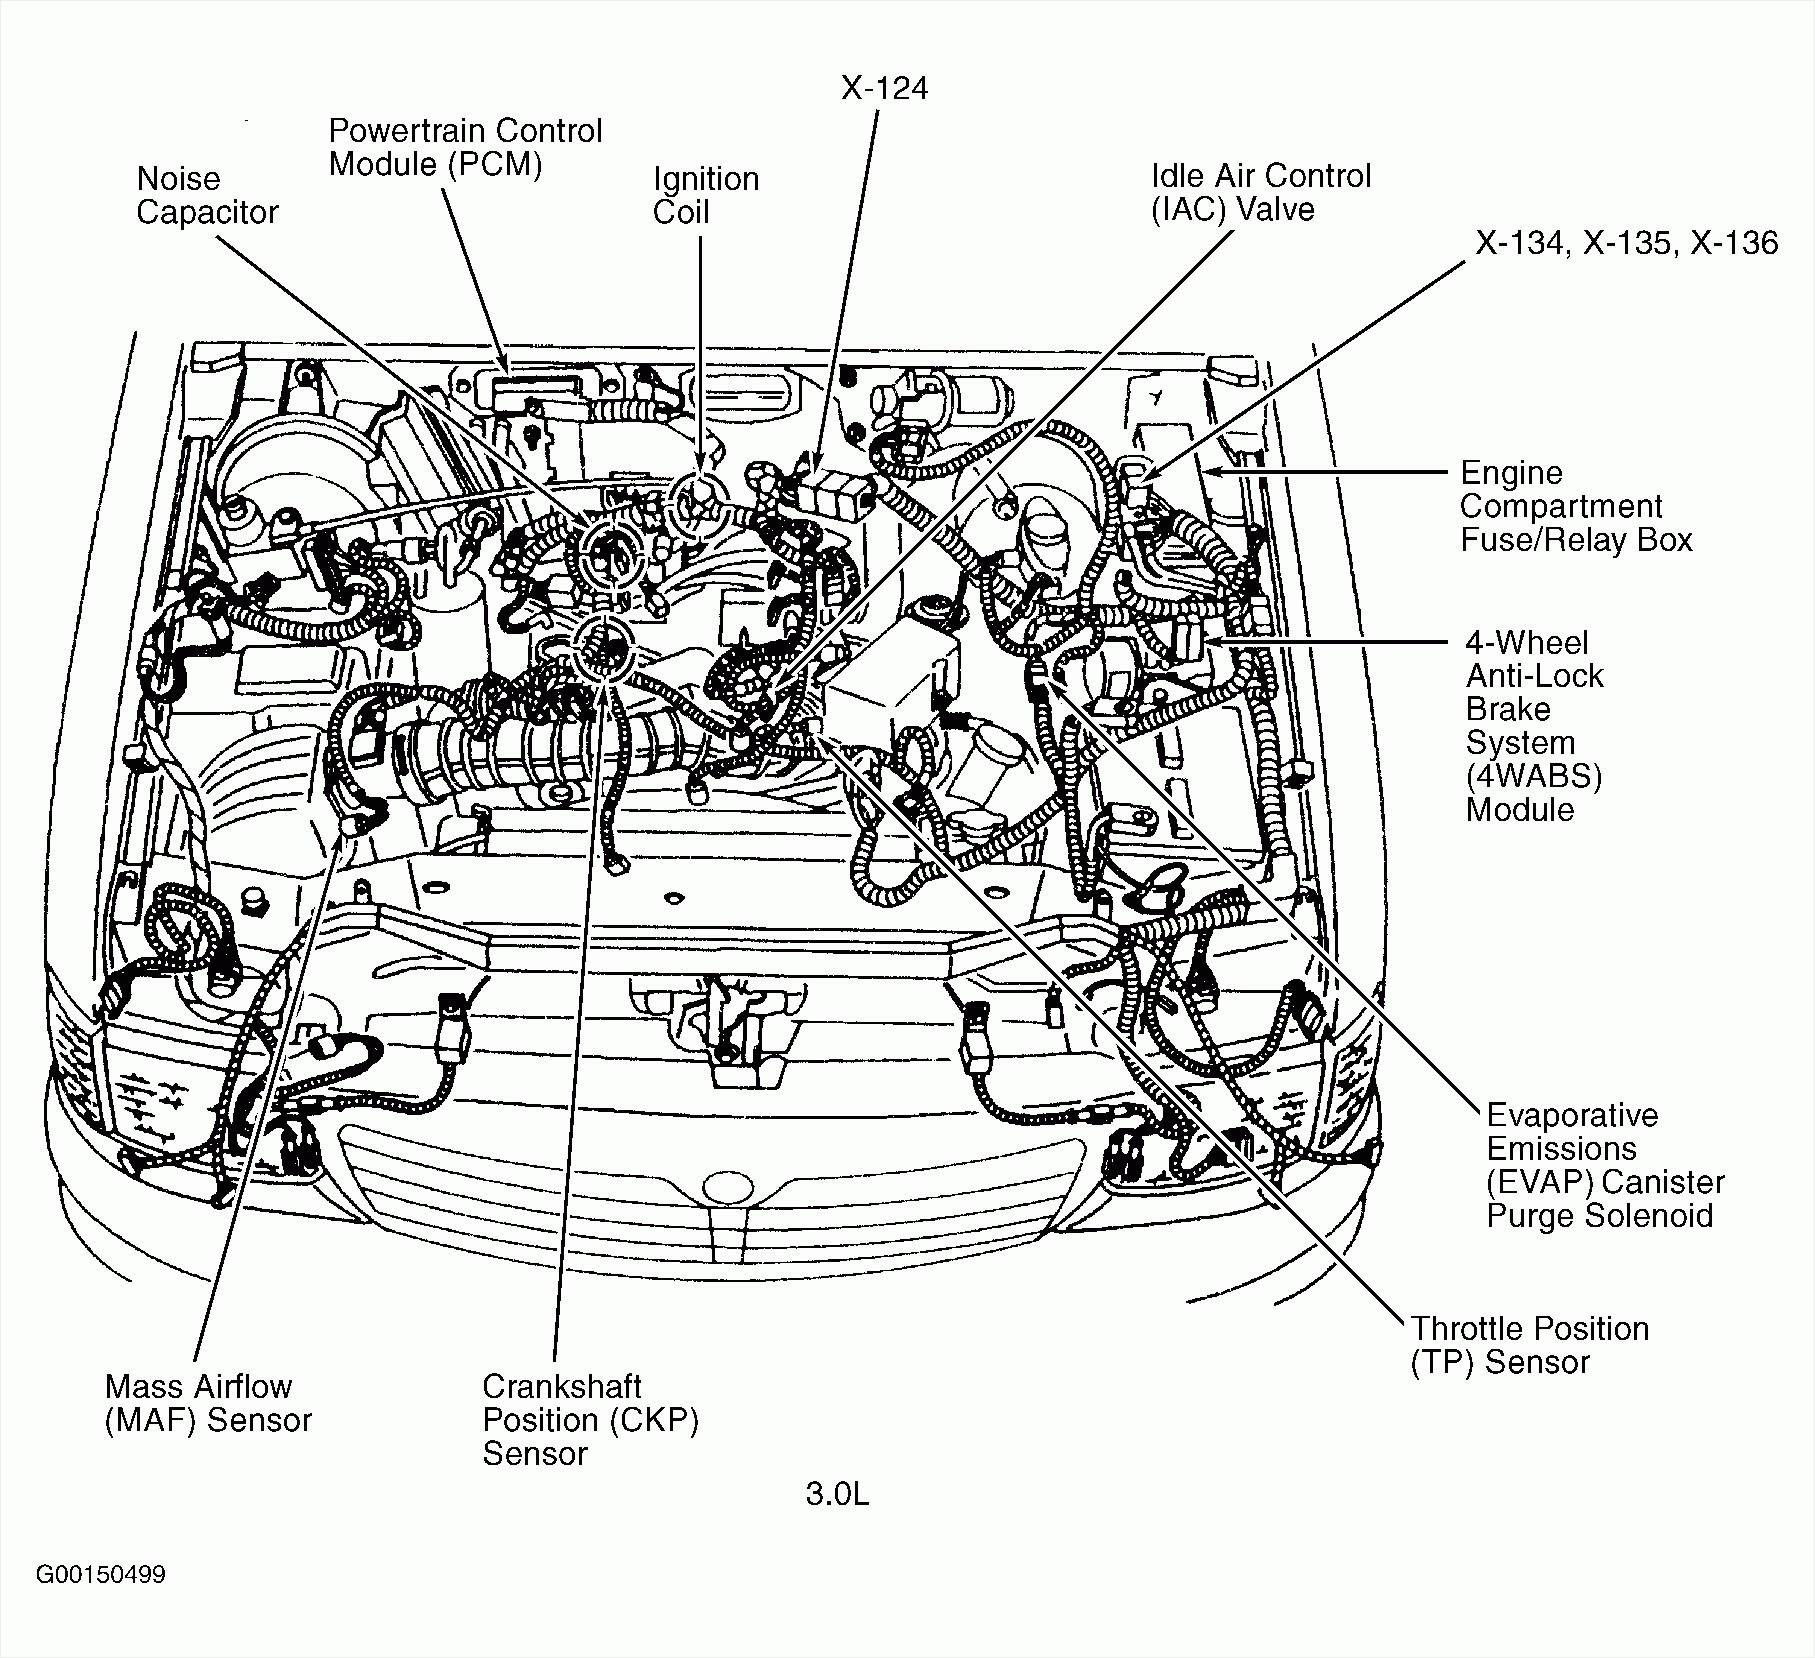 Volkswagen Beetle Engine Diagram 1974 Vw Engine Diagram Wiring Diagram Paper Of Volkswagen Beetle Engine Diagram